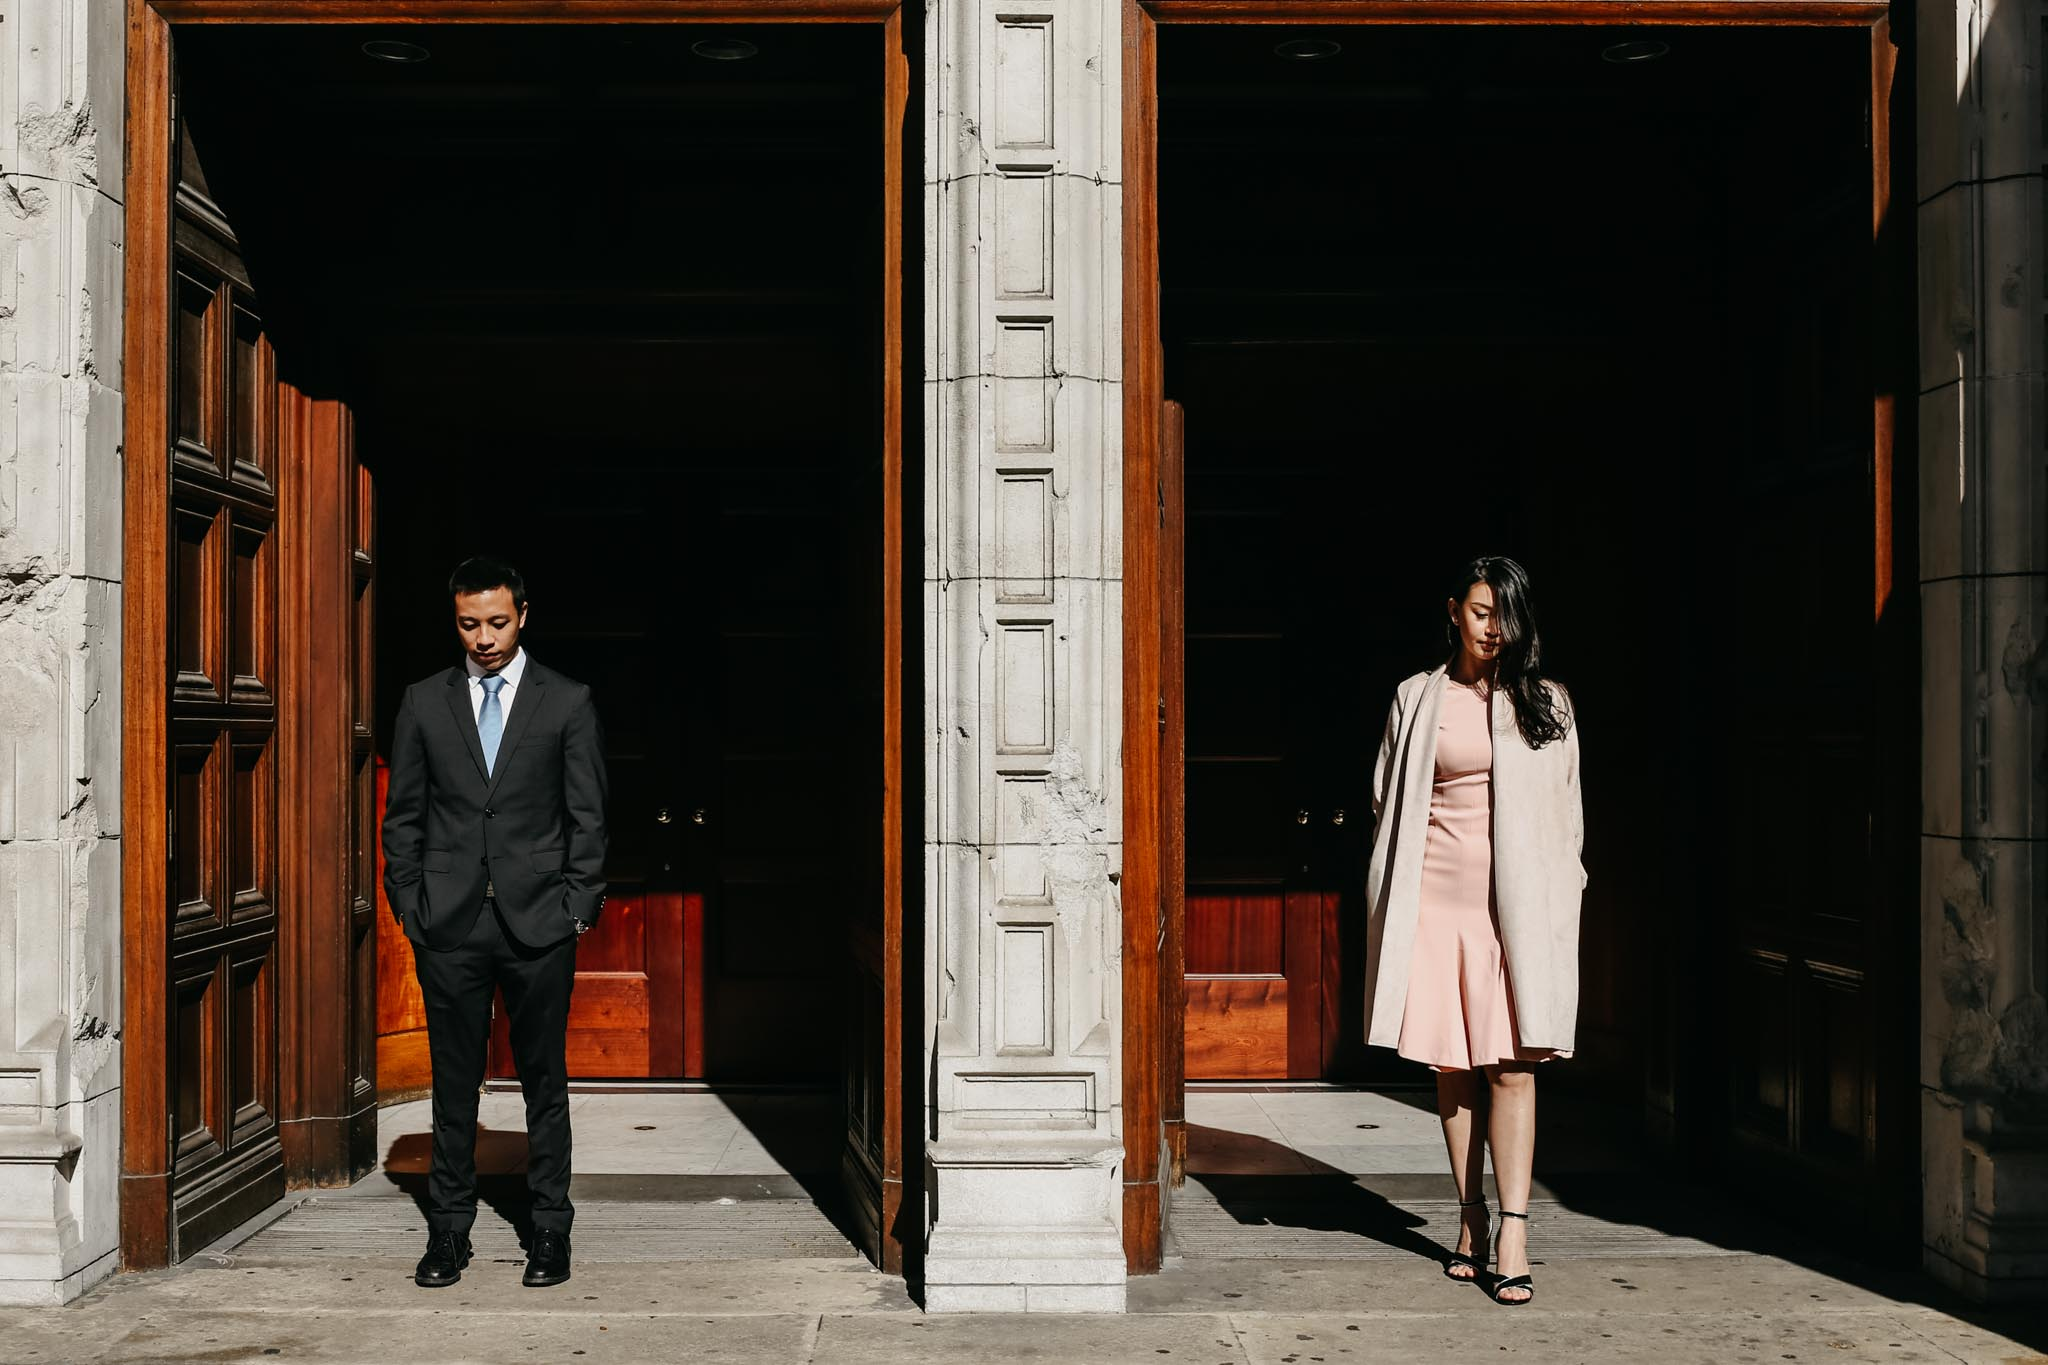 romantic south kensignton engagement shoot in london